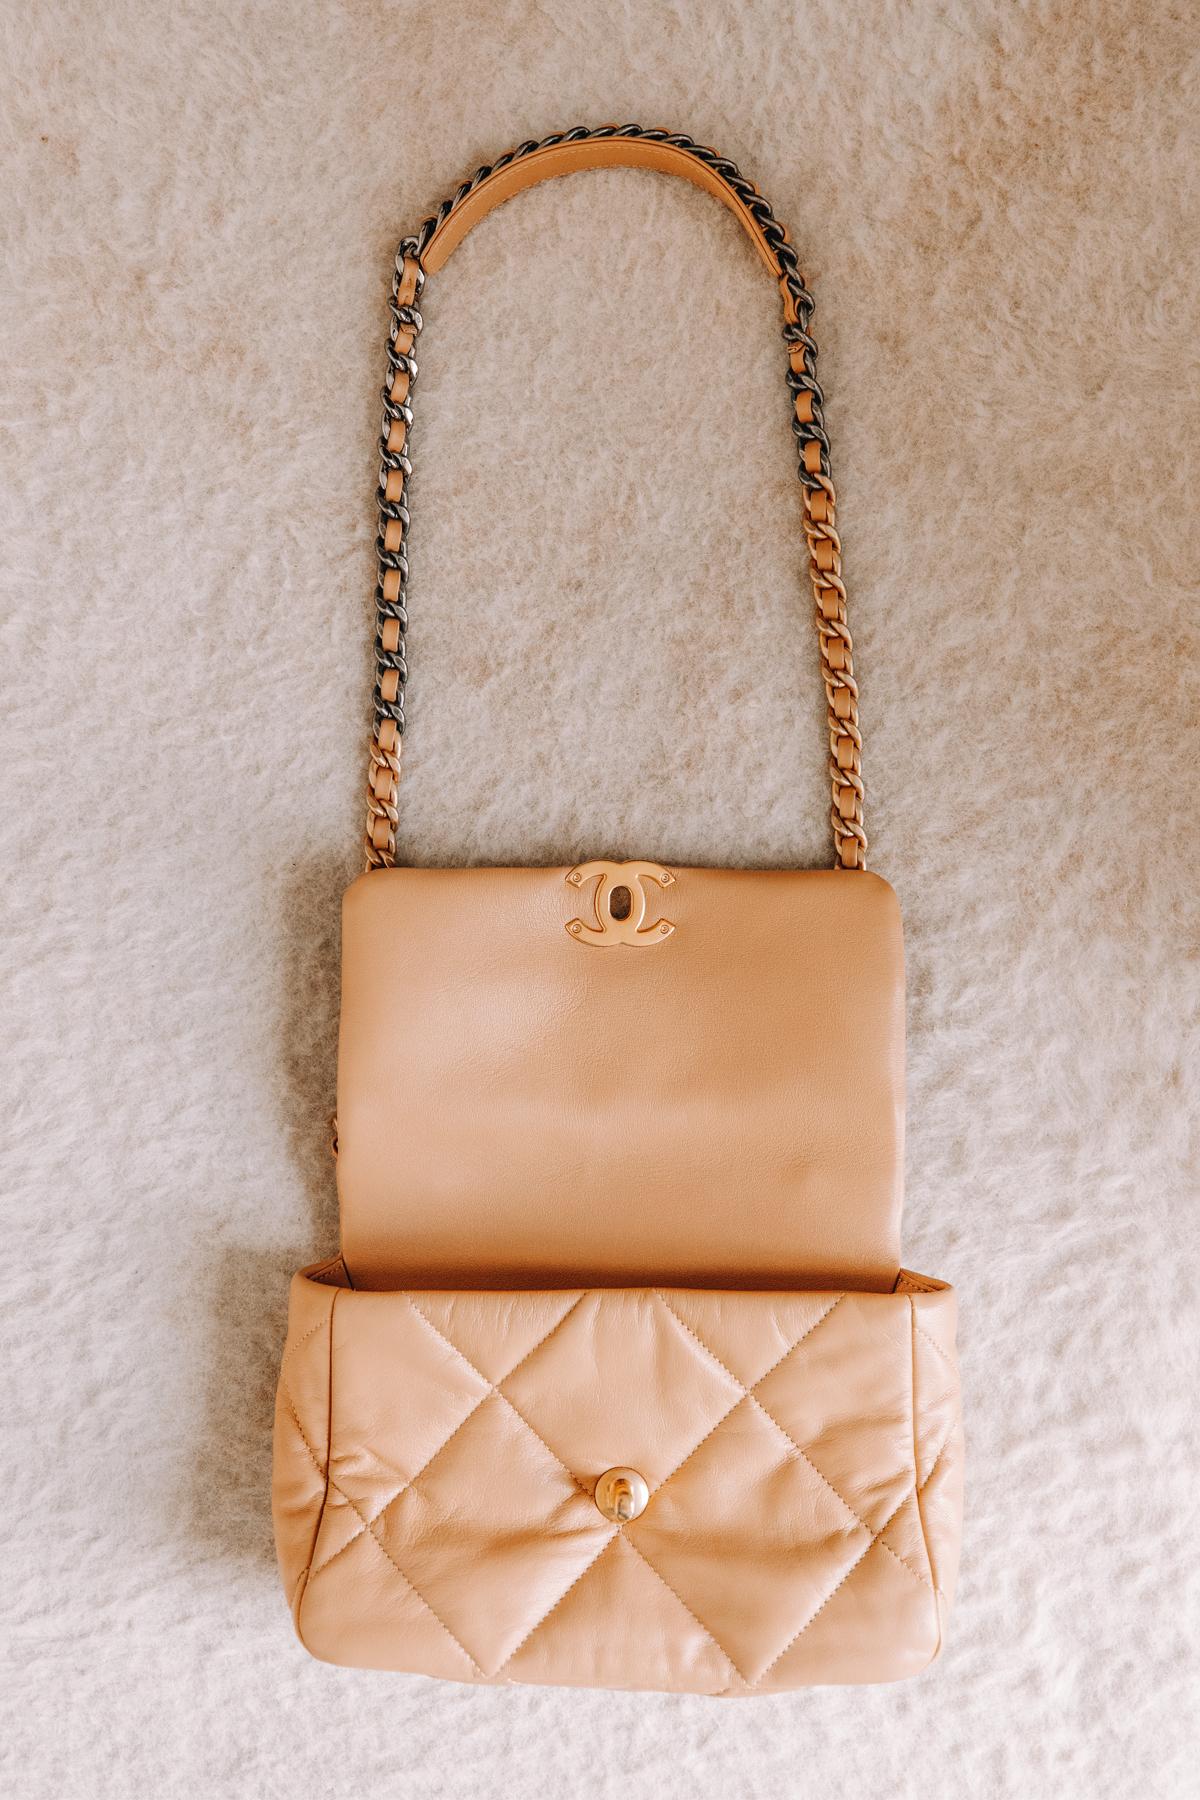 Fashion Jackson Chanel 19 Classic Small Dark Beige Handbag 1